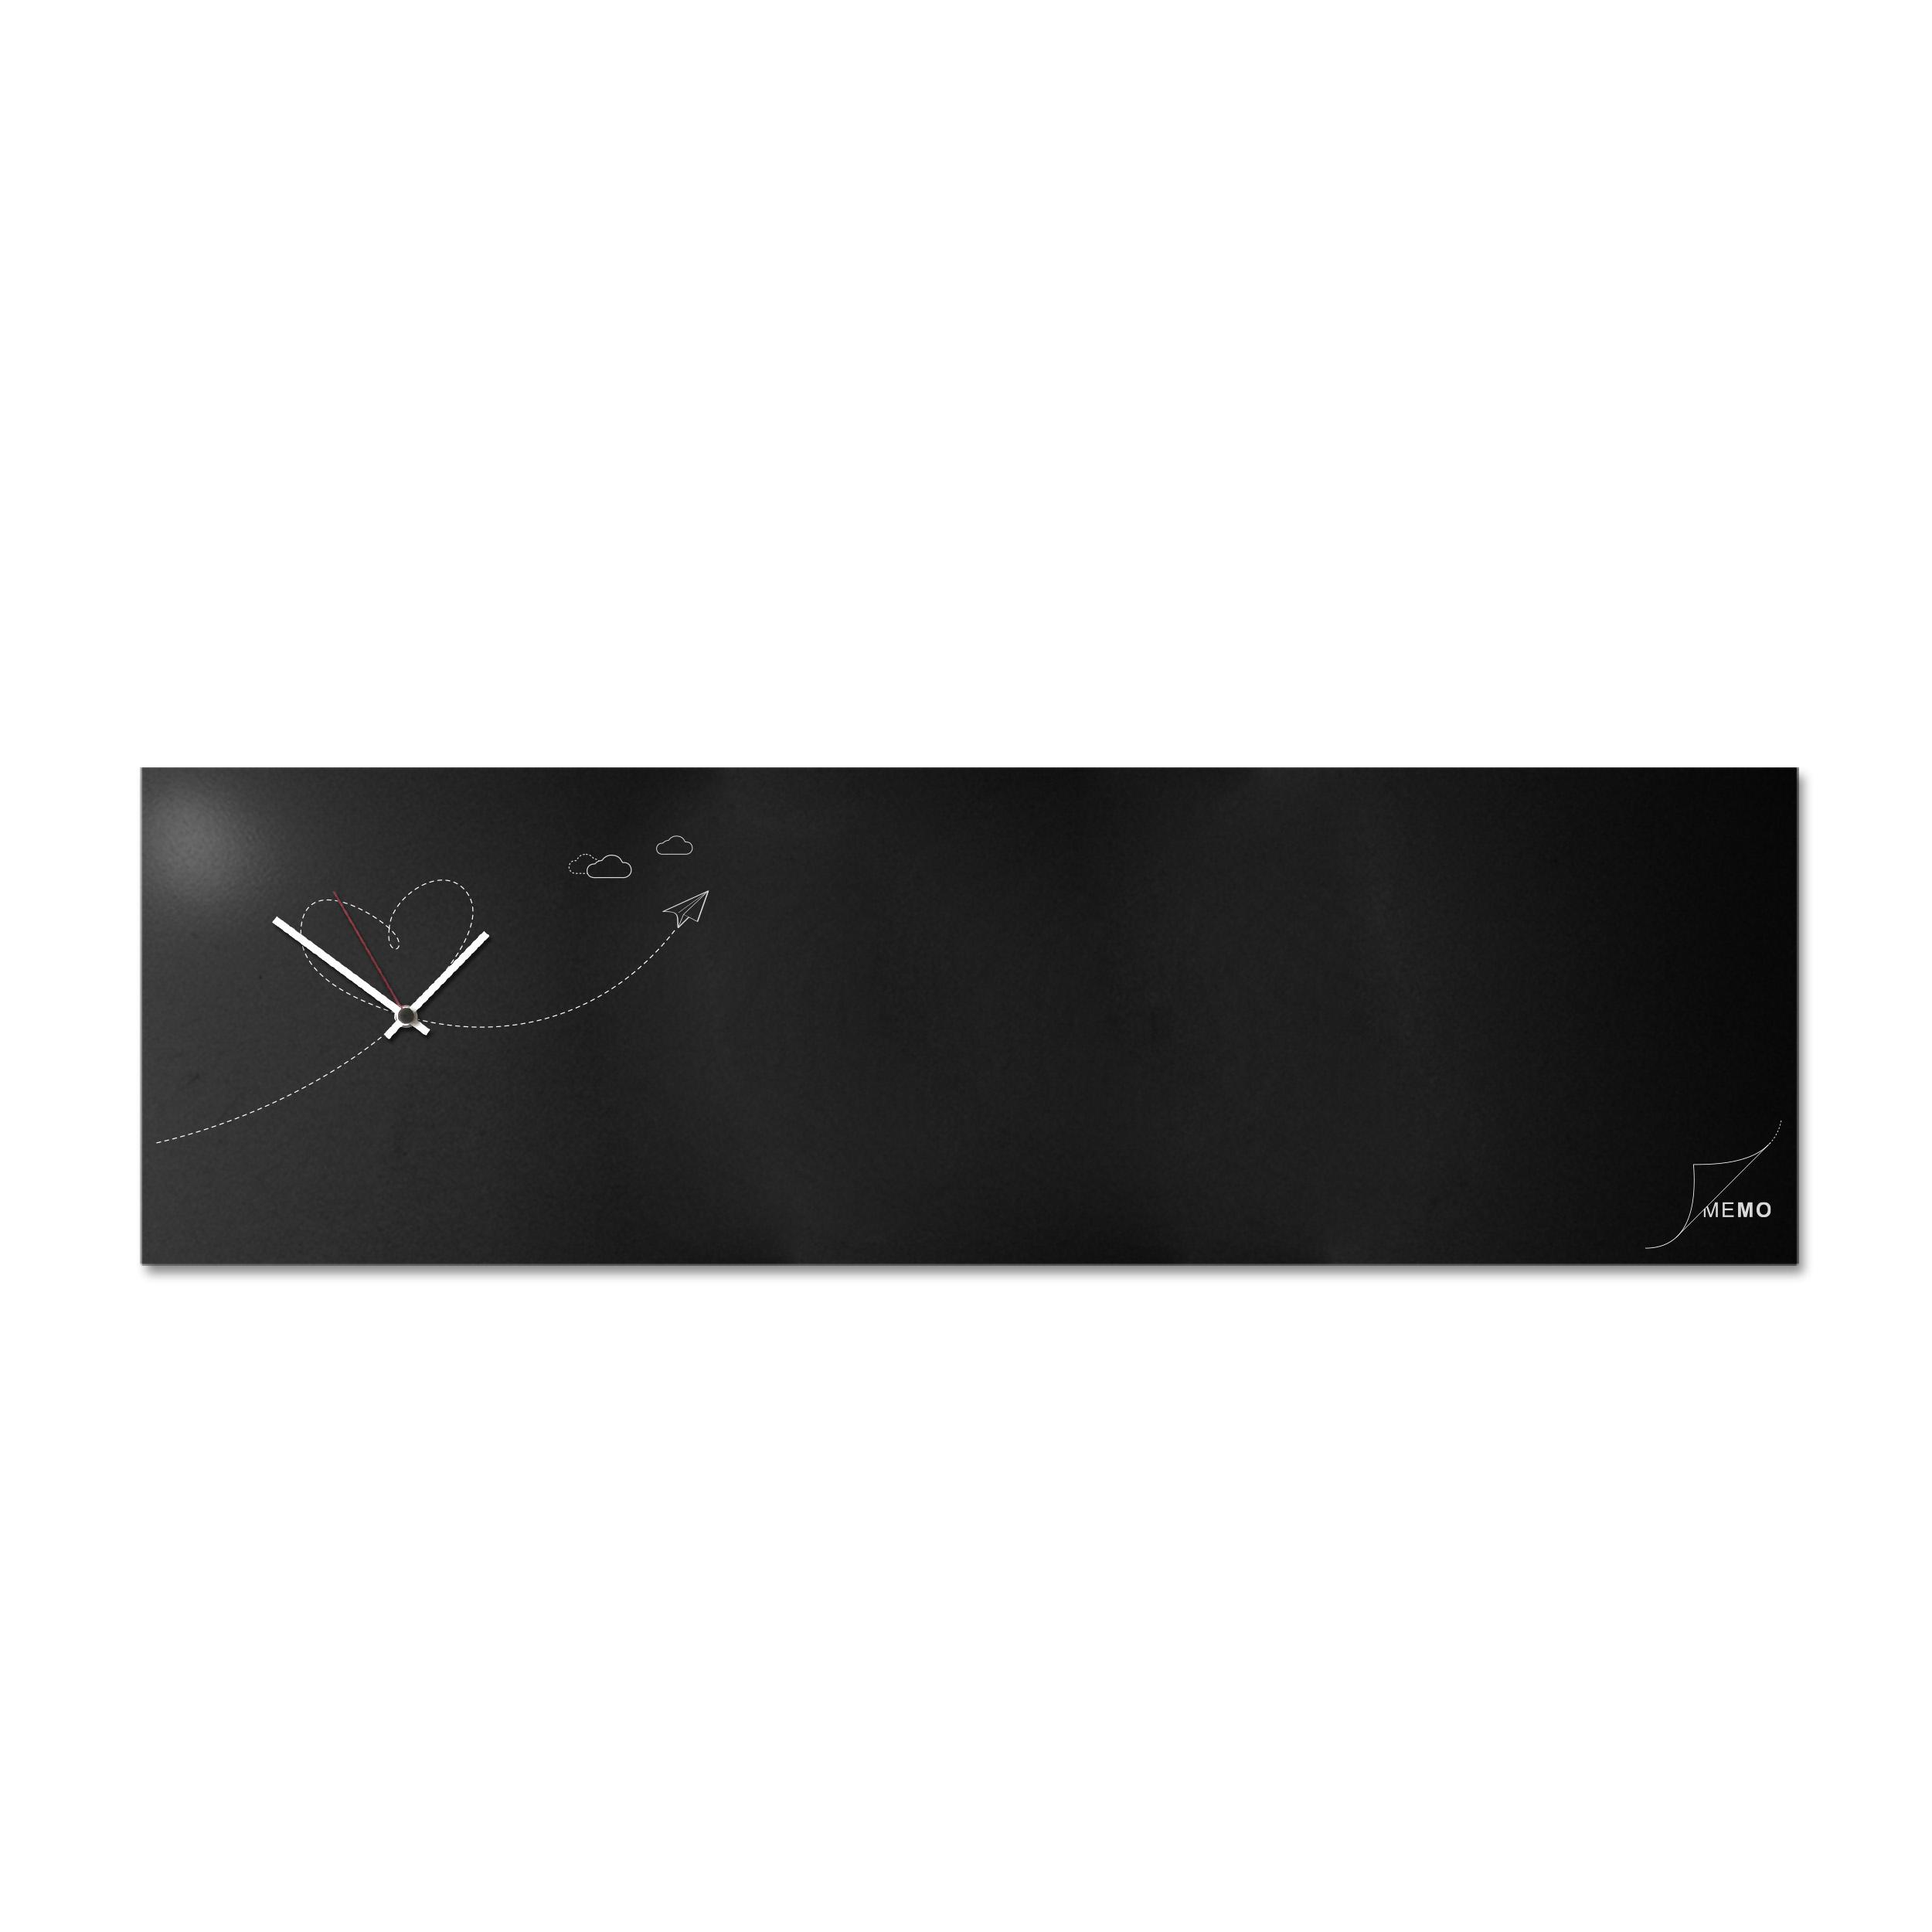 orologio design metallo aereo carta